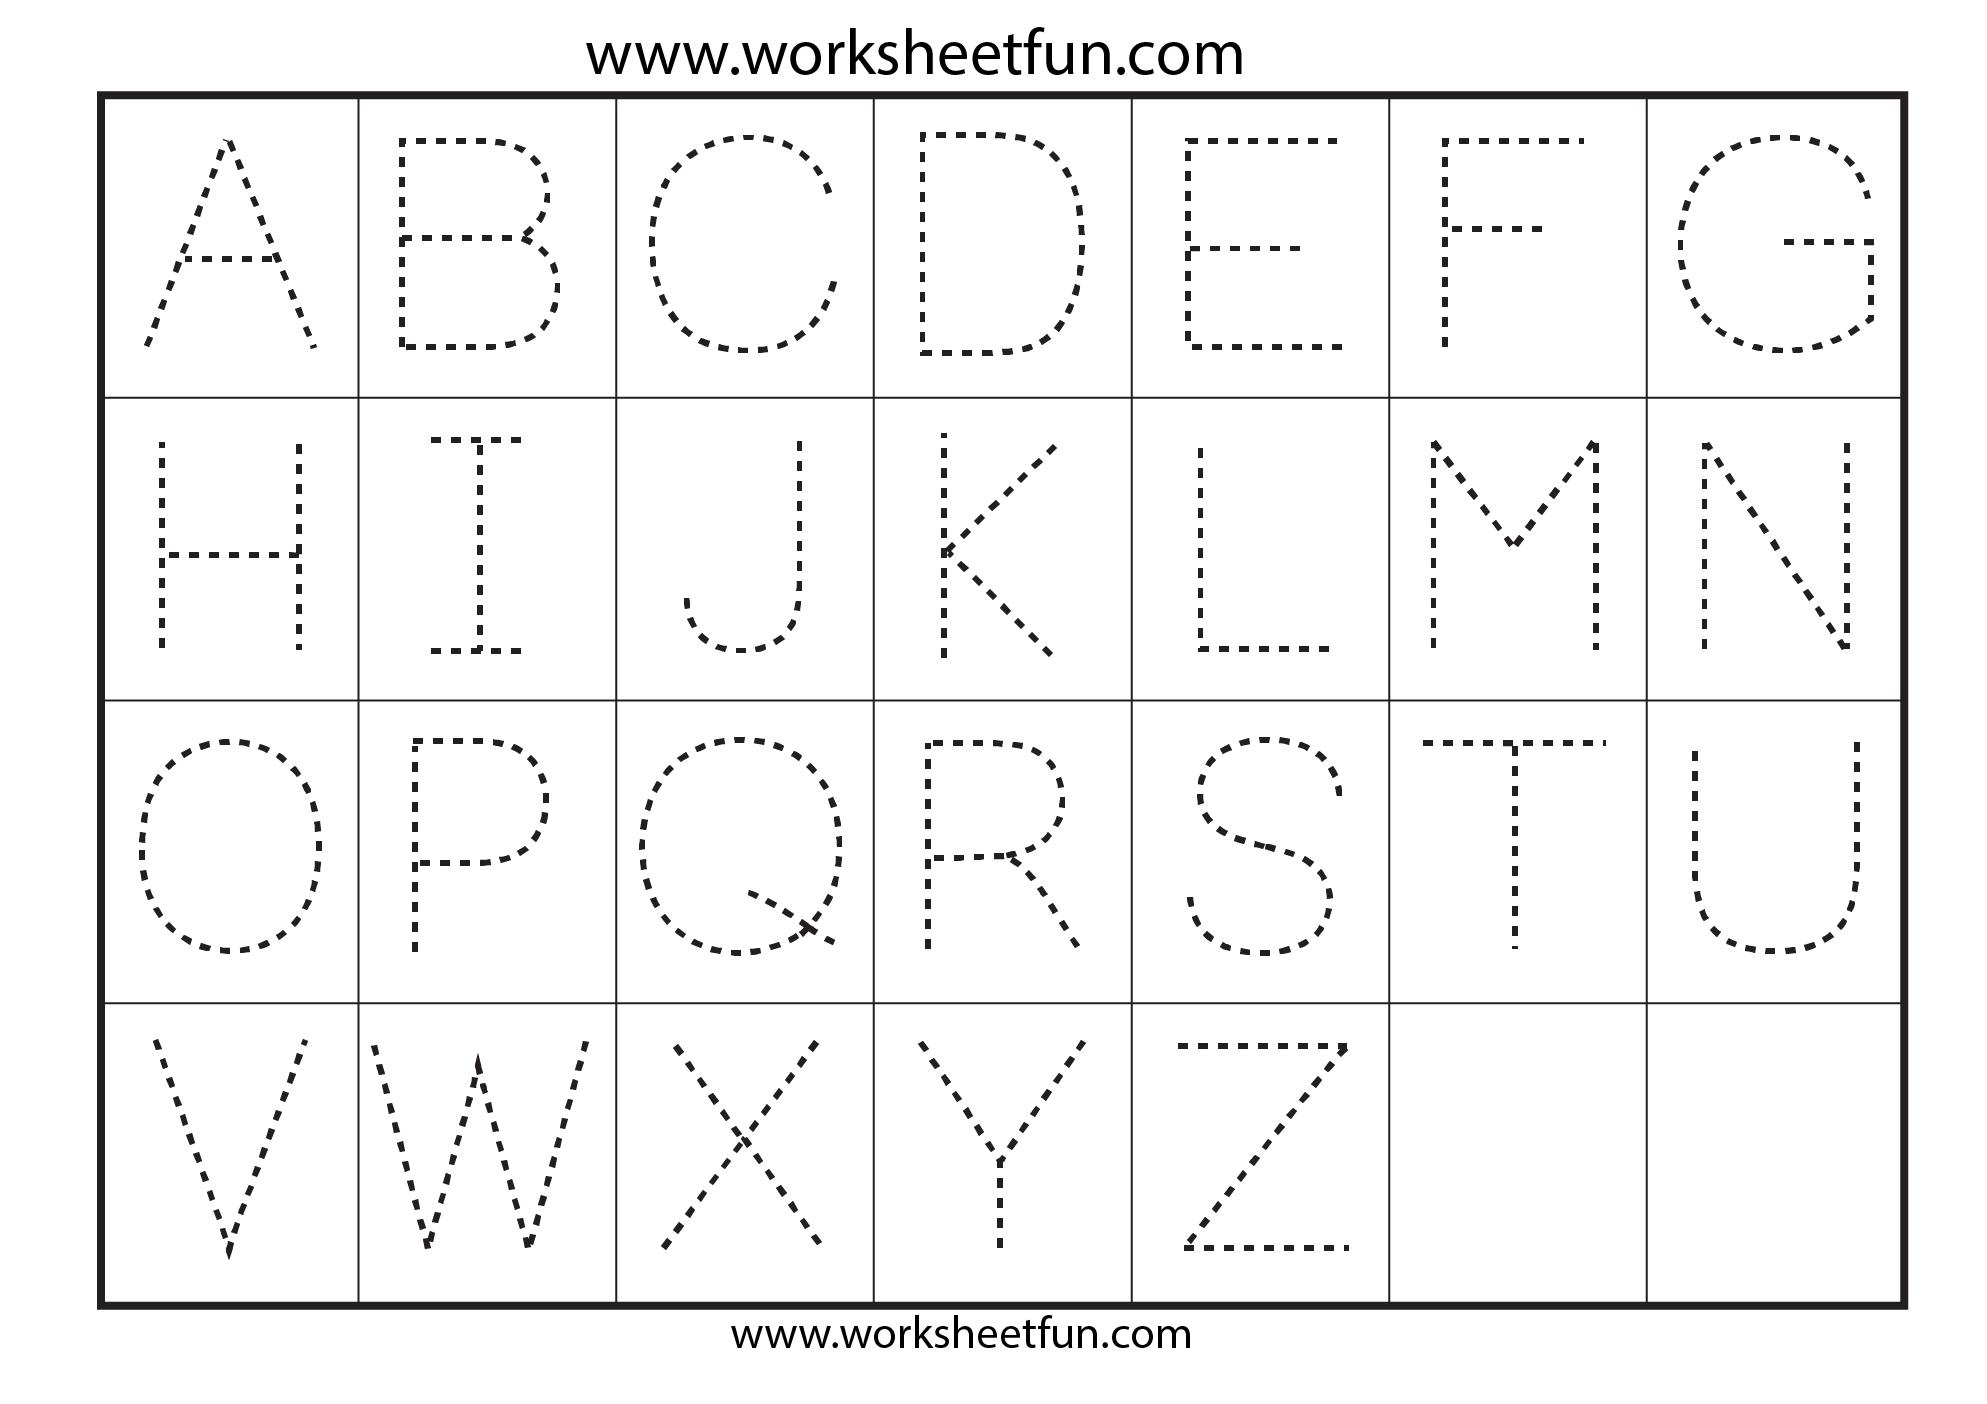 Free English Worksheets